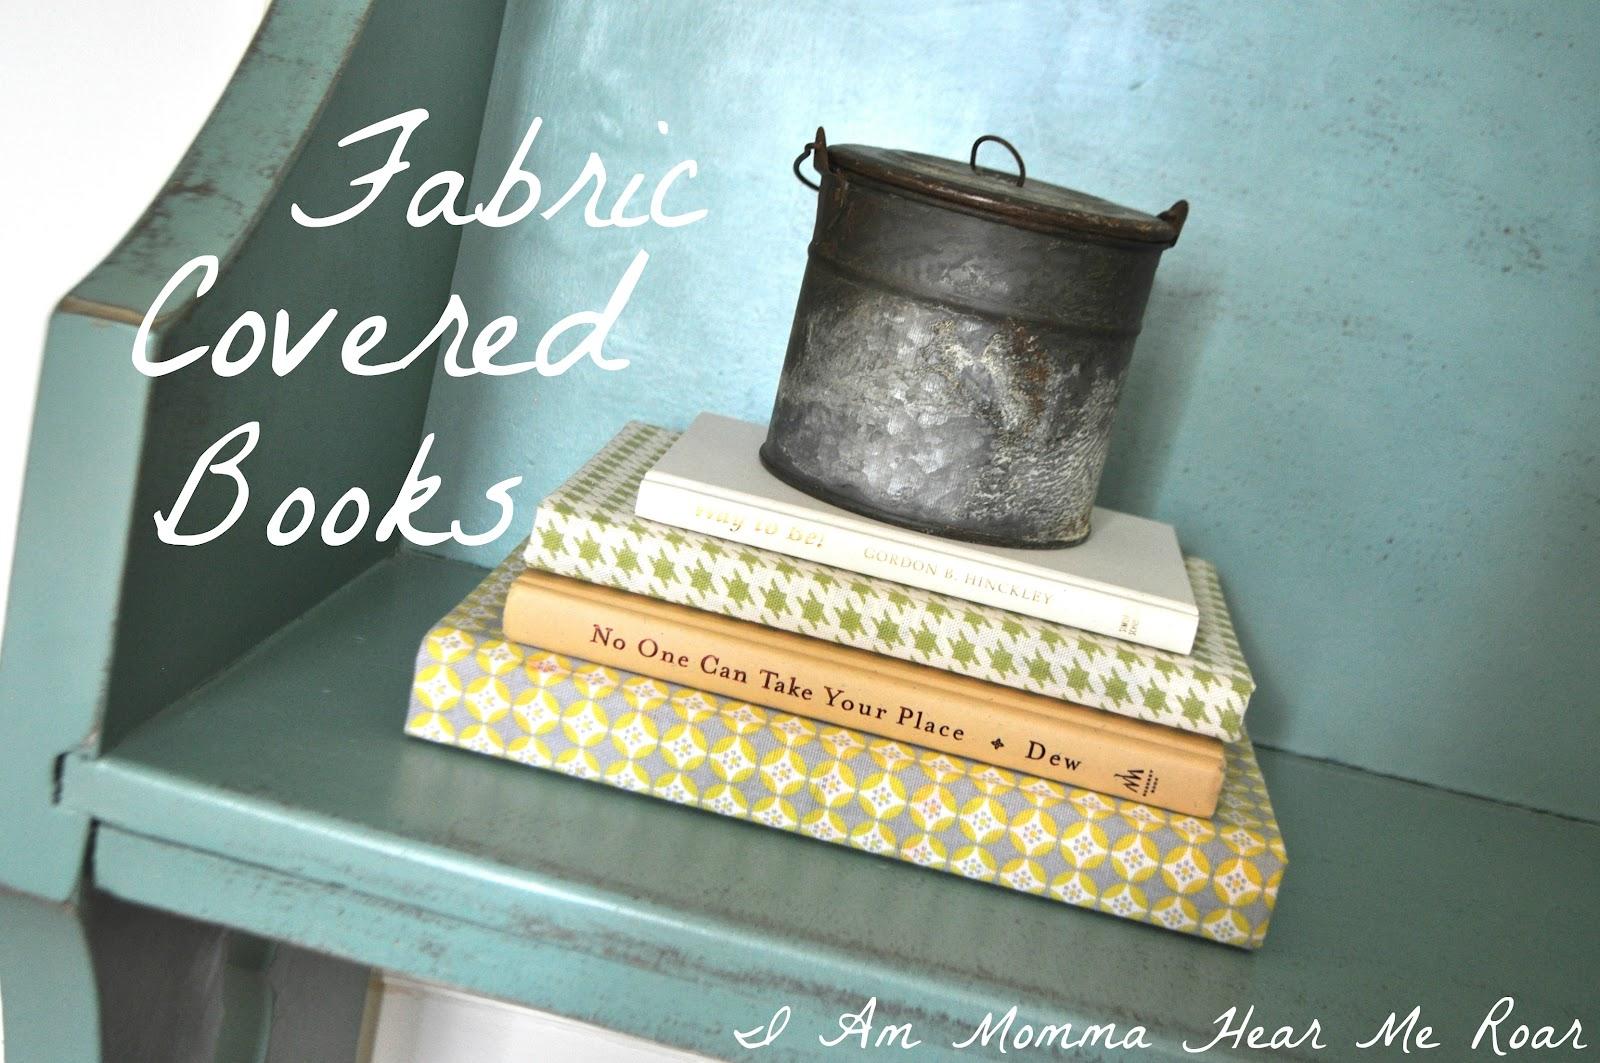 Fabric Covered Book : I am momma hear me roar fabric covered books